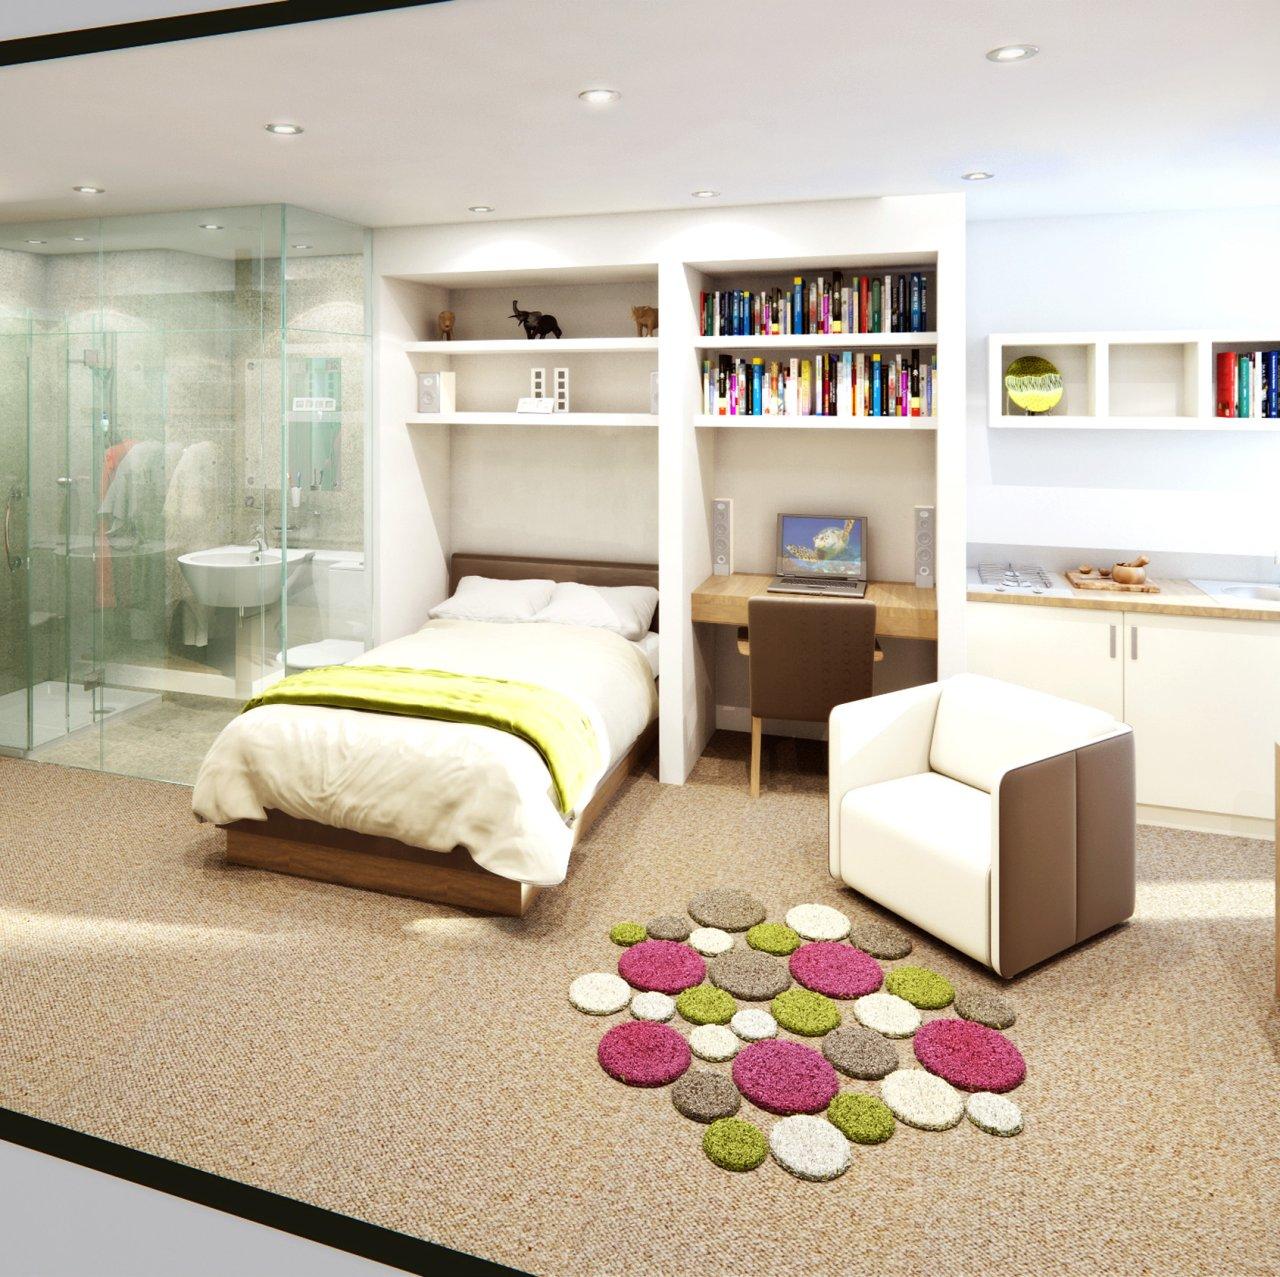 Appleton Point Student Accommodation Investment Bradford DIGS South Street Asset Management